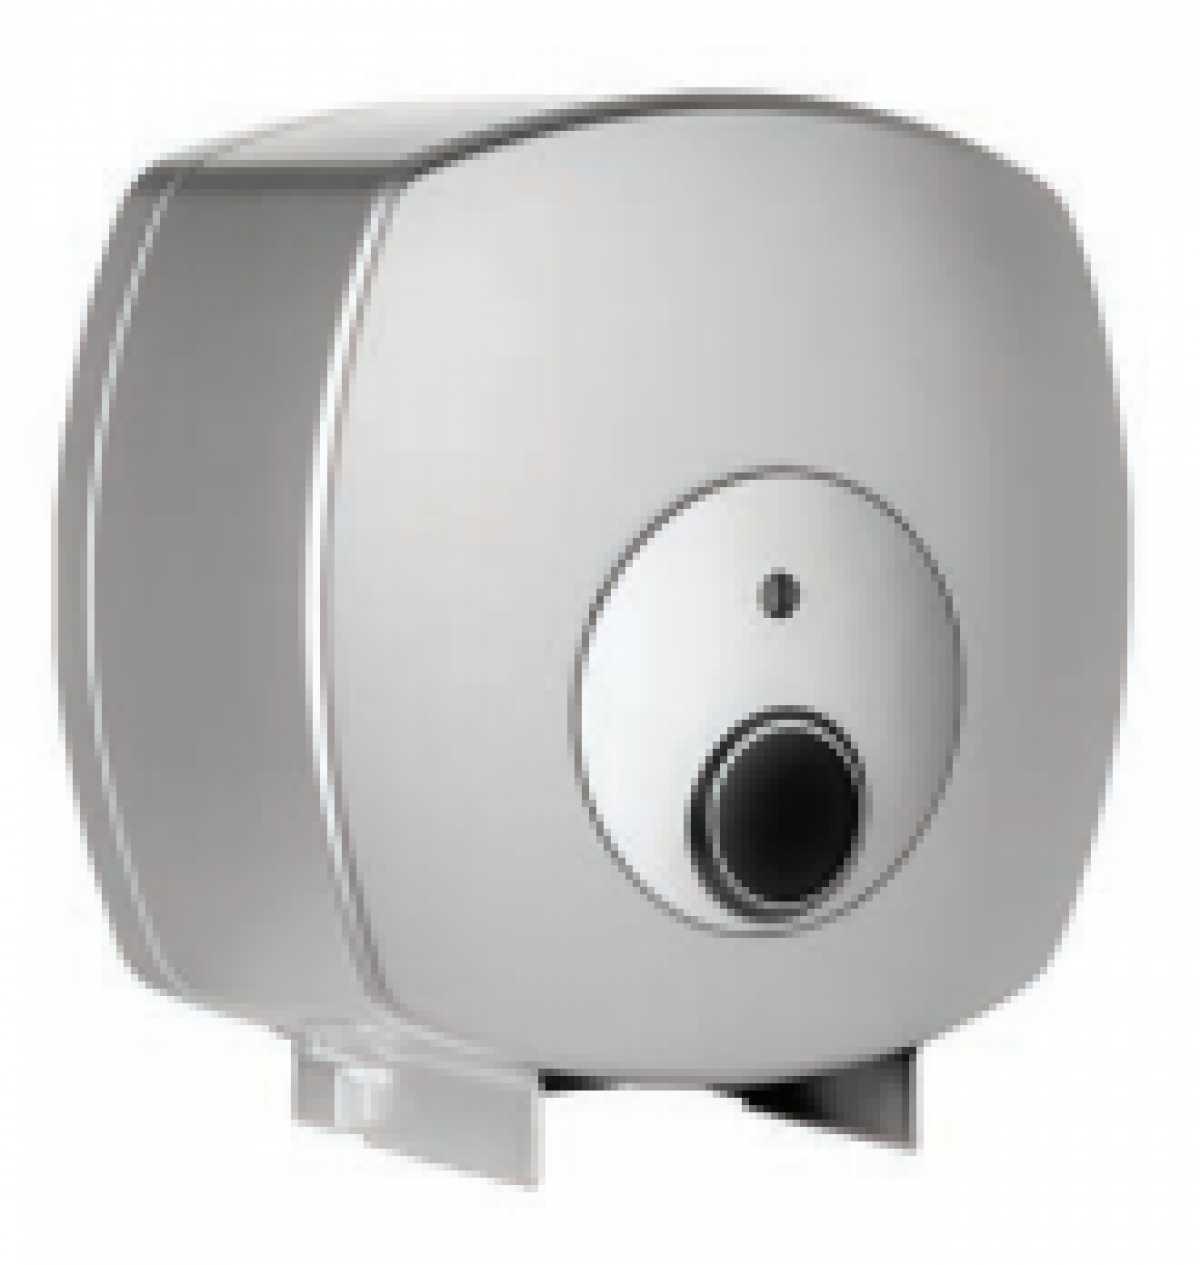 Rulo Tuvalet Kağıt Dispenseri